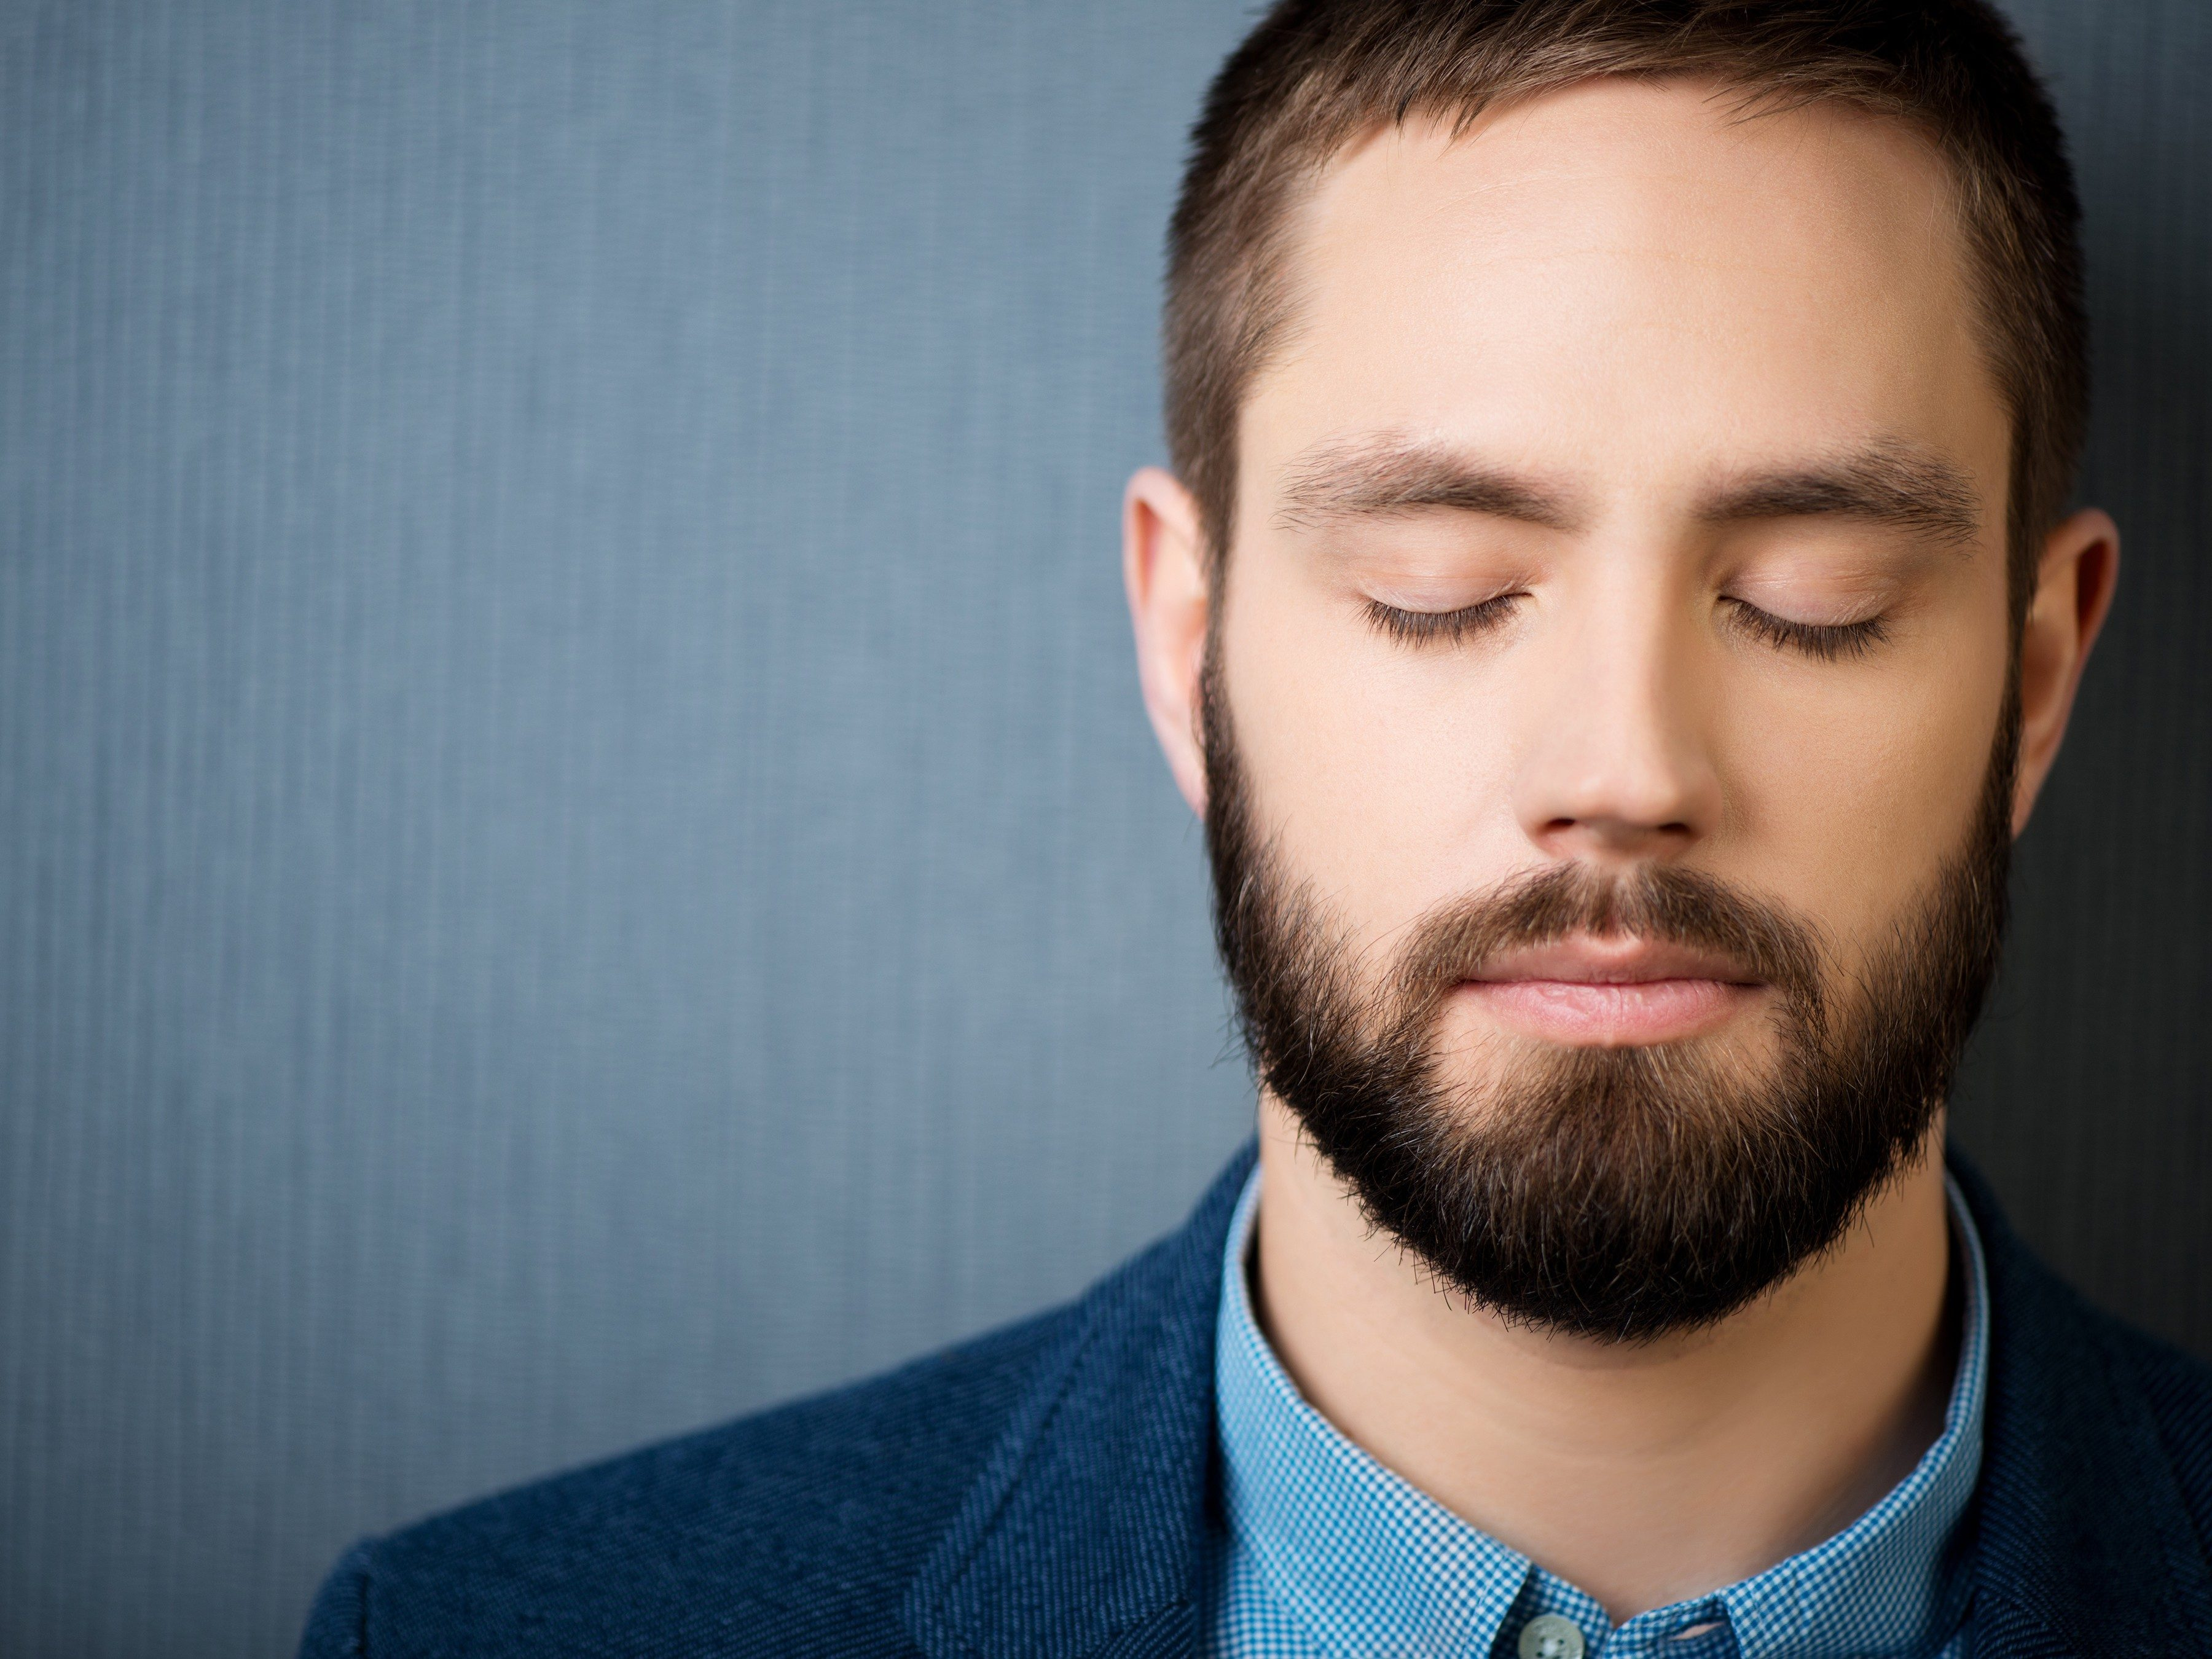 8. Self-hypnosis